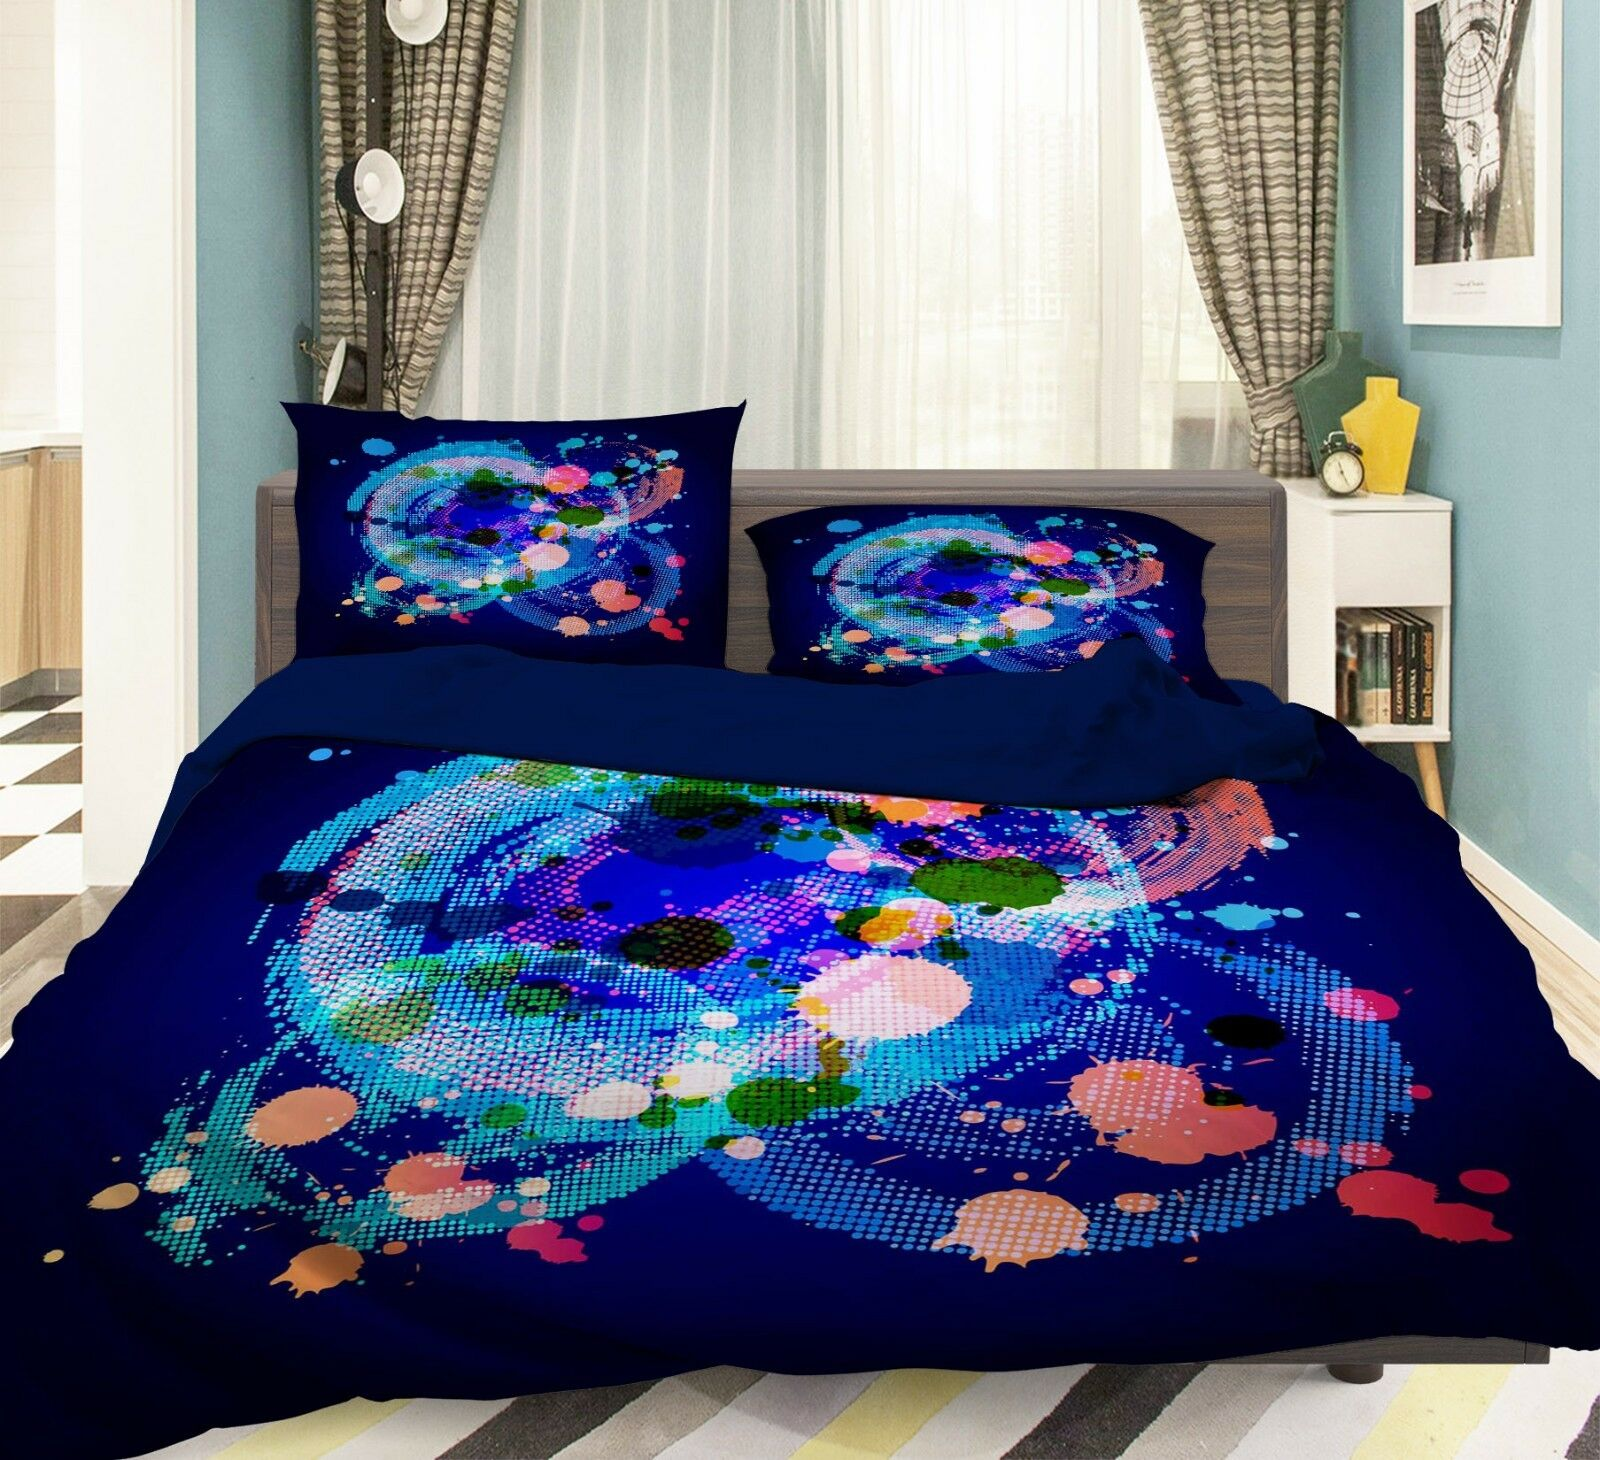 3D Painted Graffiti8 Bed Pillowcases Quilt Duvet Cover Set Single Queen AU Carly